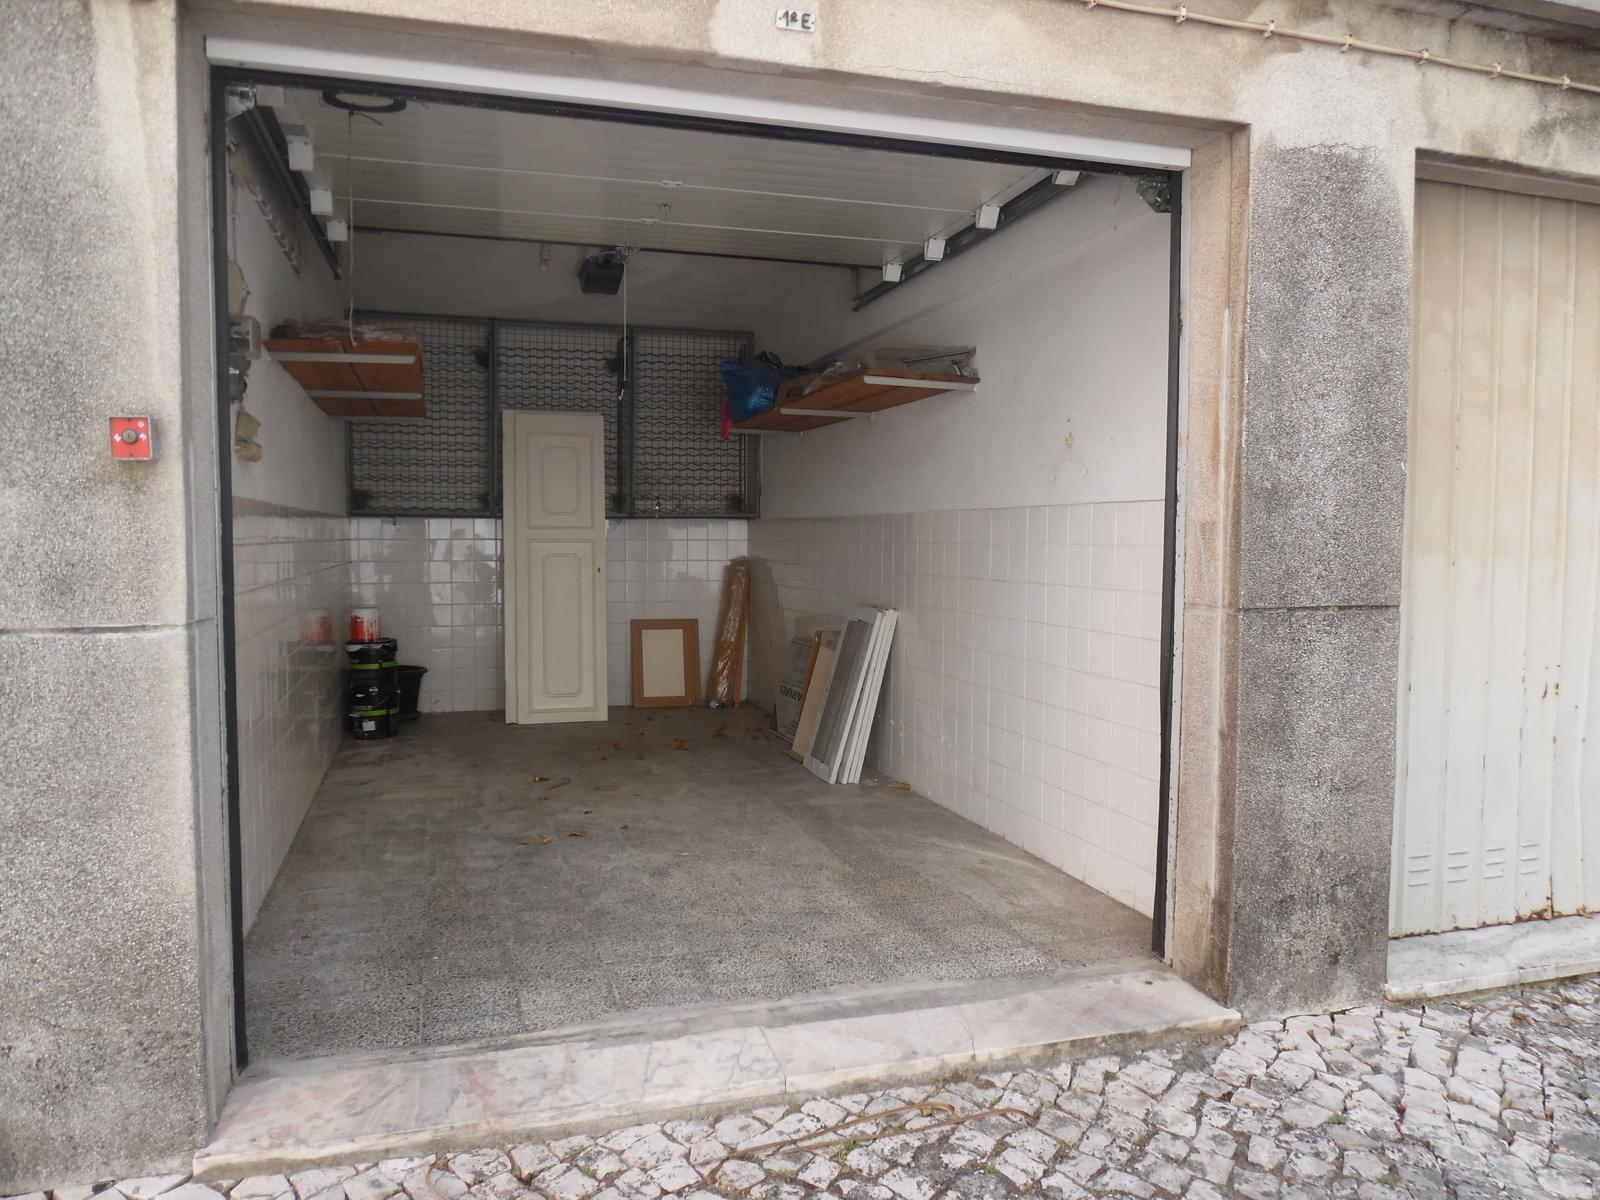 pf17621-apartamento-t4-lisboa-3e390e79-e812-4672-8d4b-fee3a9dd7484